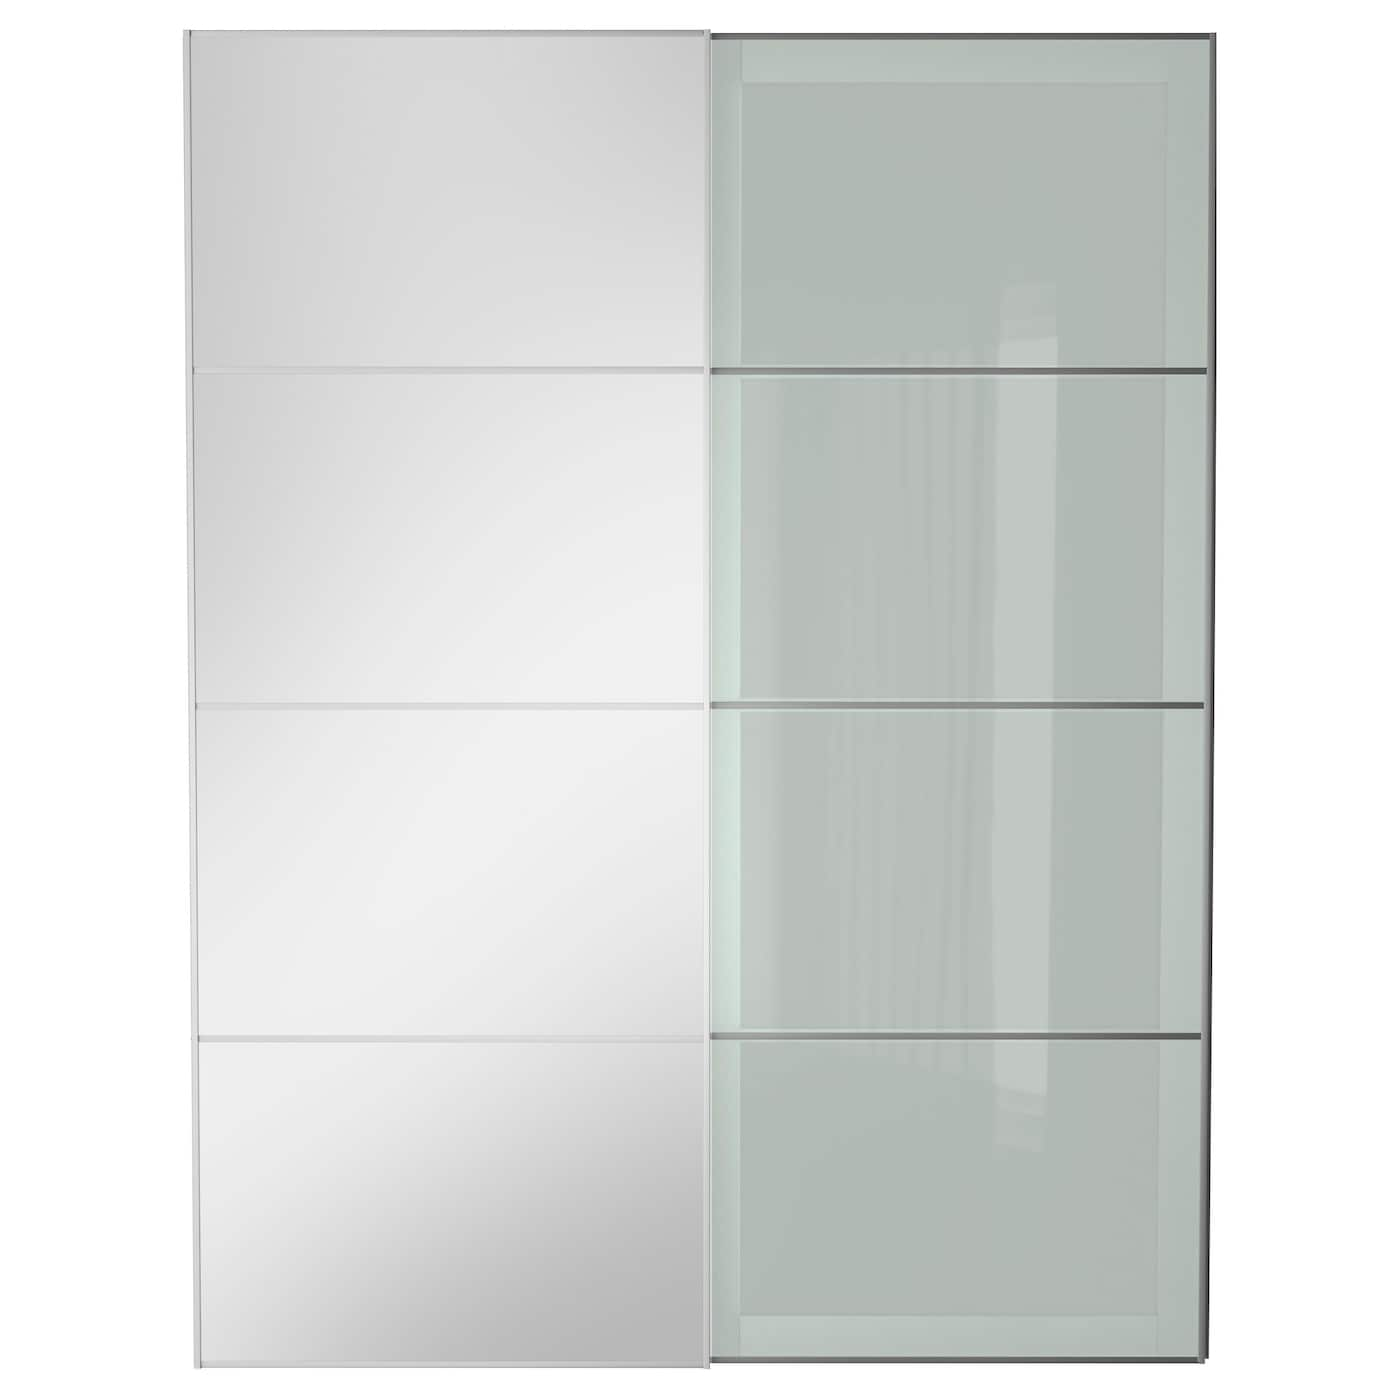 AULI SEKKEN Pair of sliding doors Mirror glass frosted